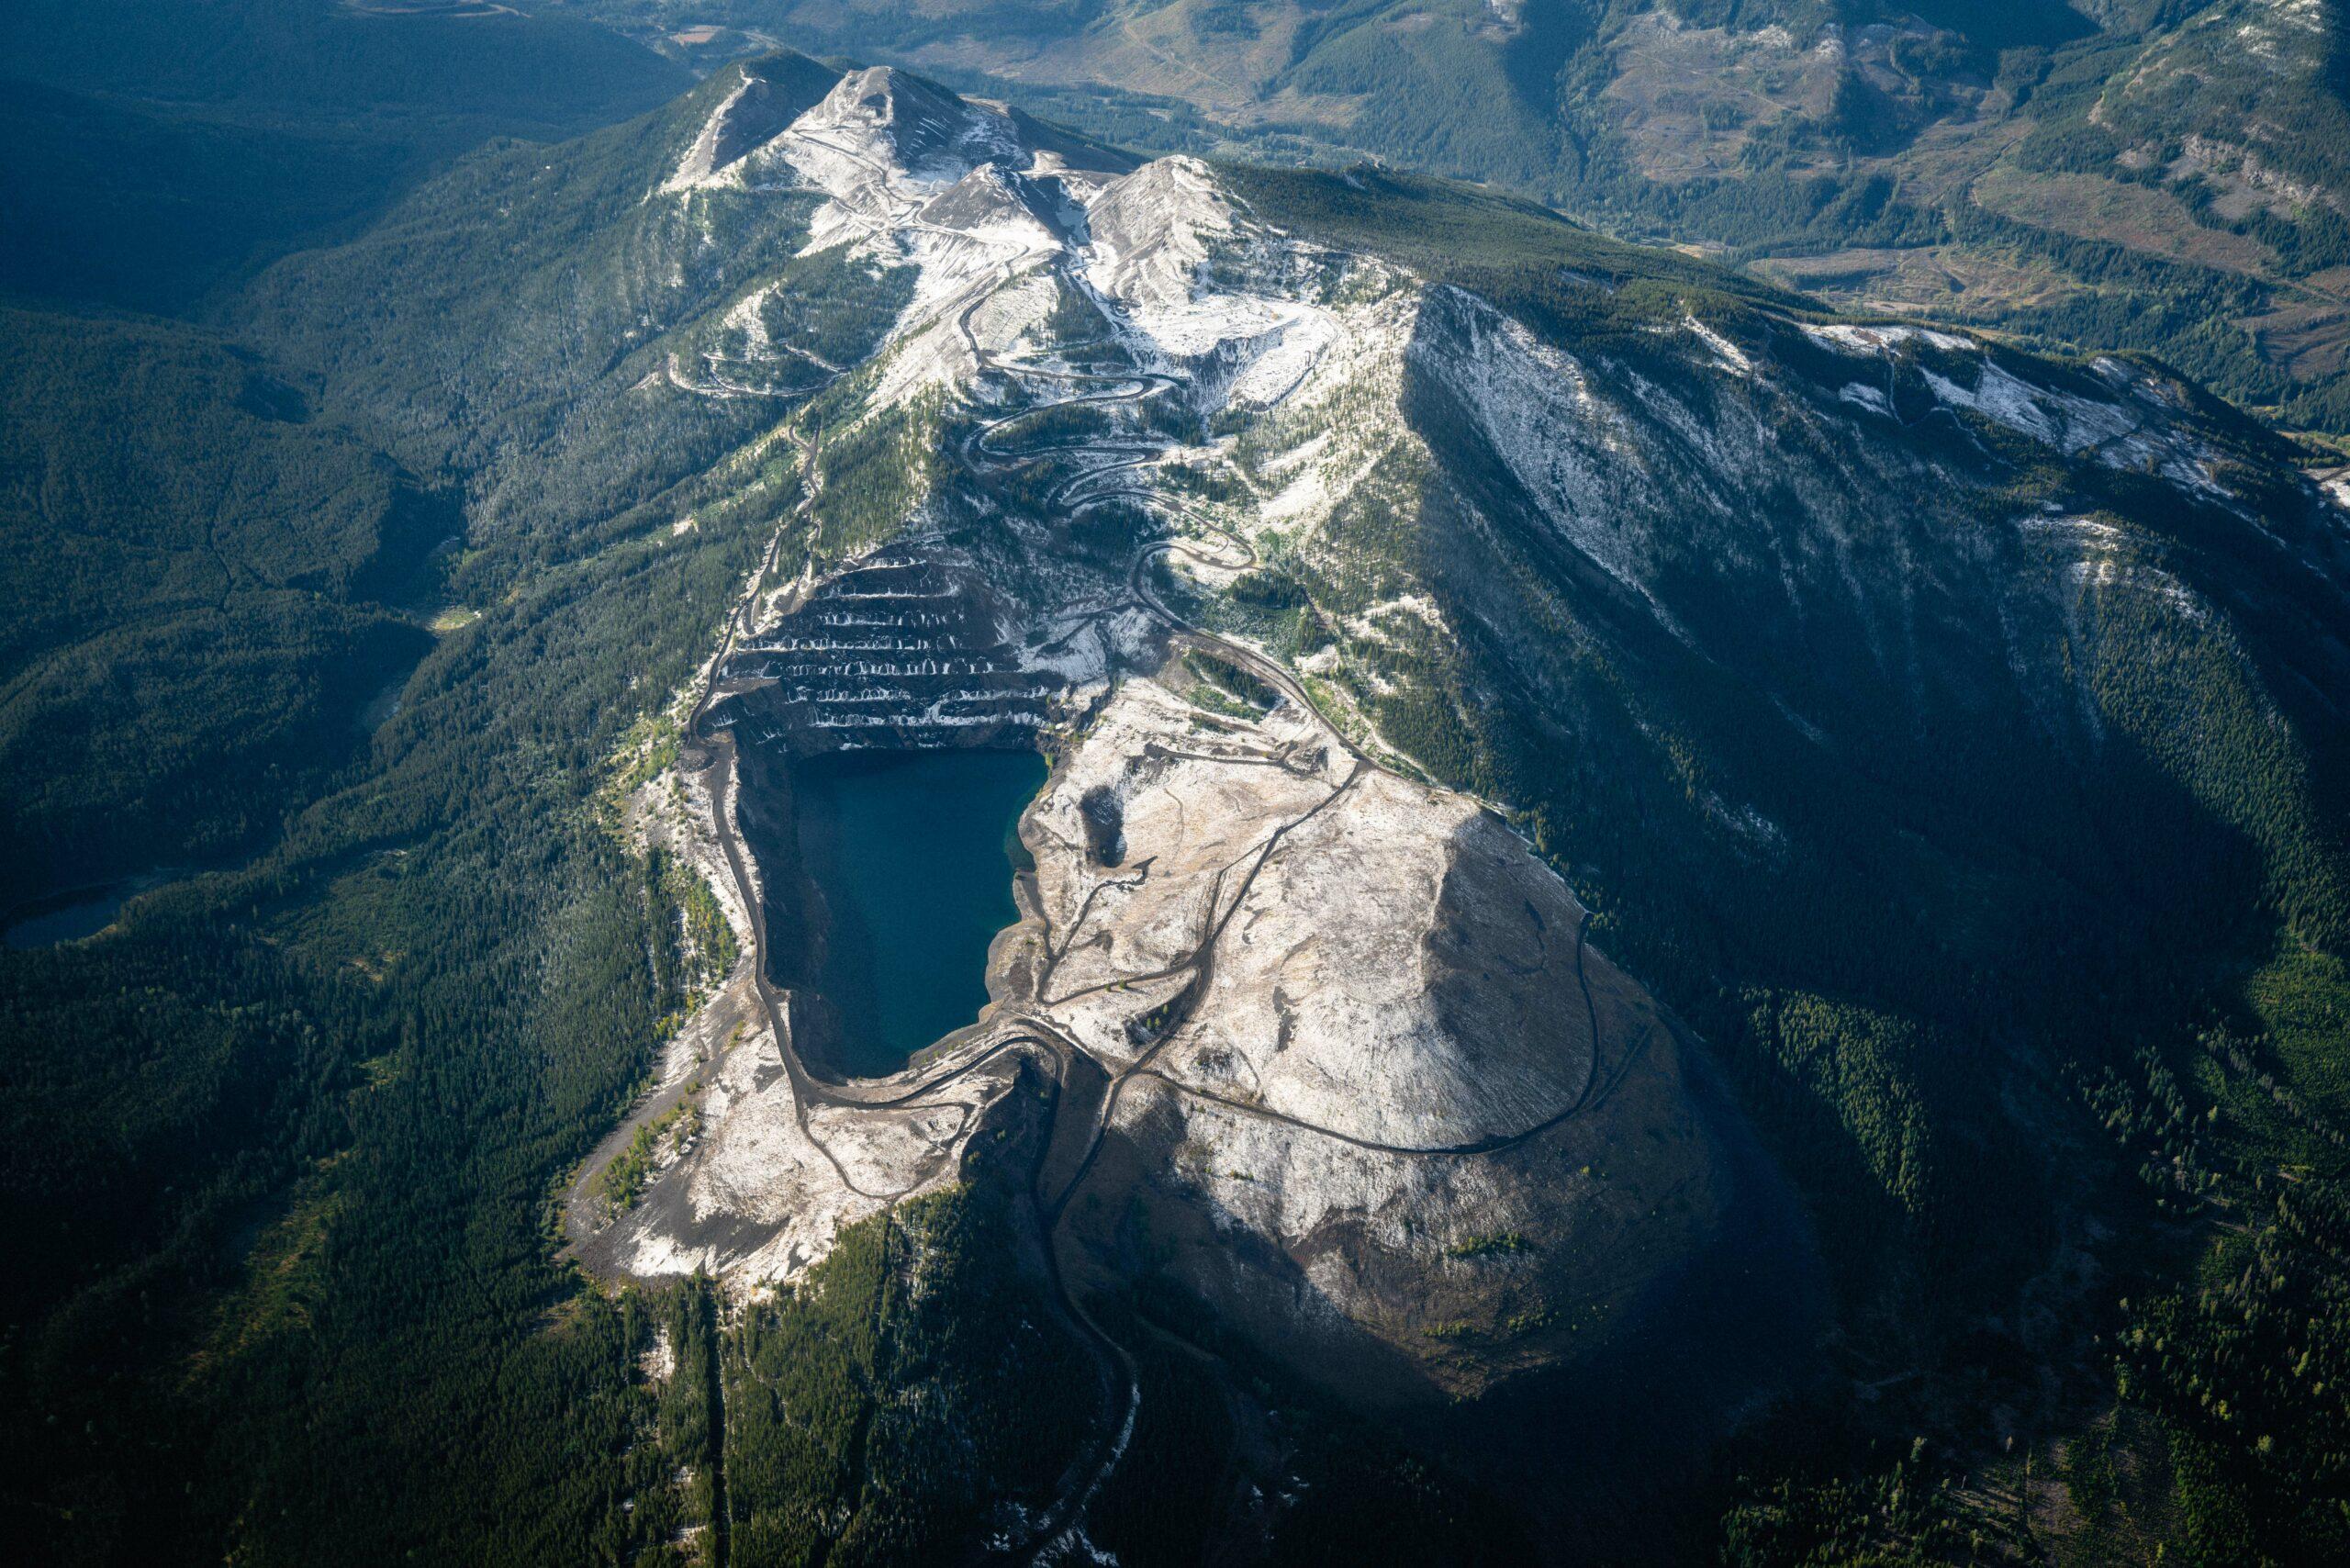 aerial view of mine in southwestern Alberta